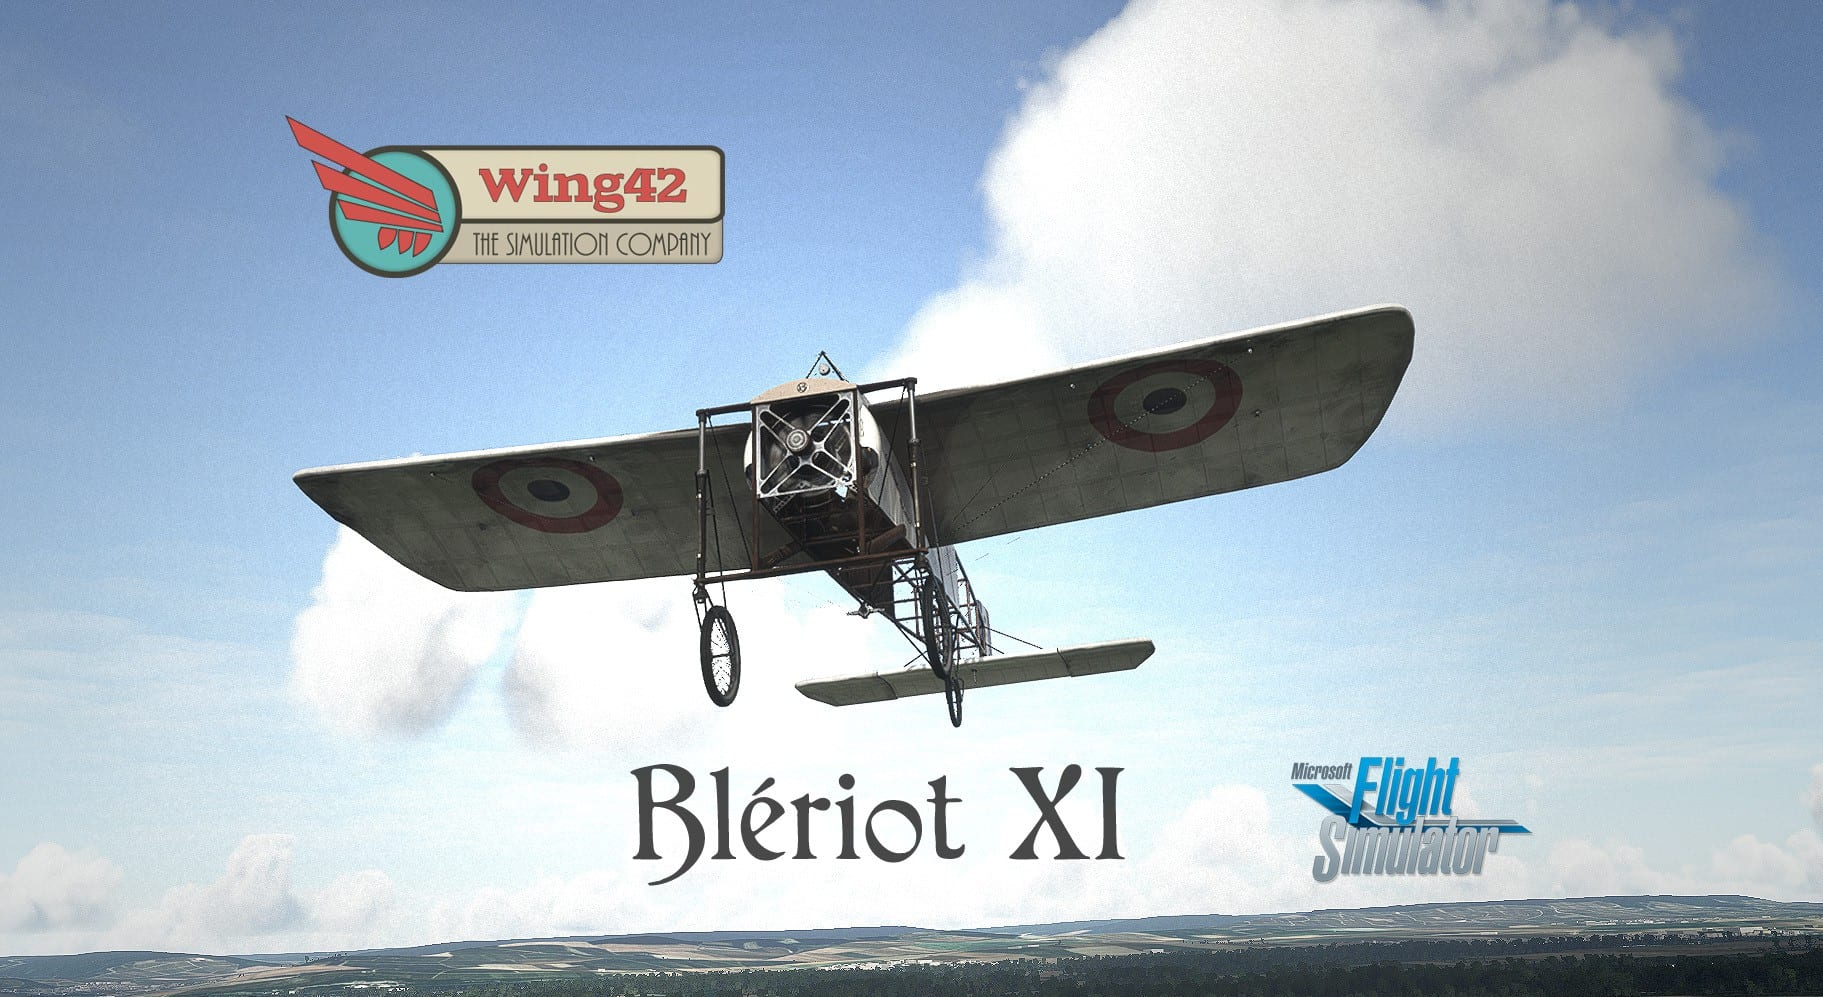 Microsoft Flight Simulator, Bleriot XI